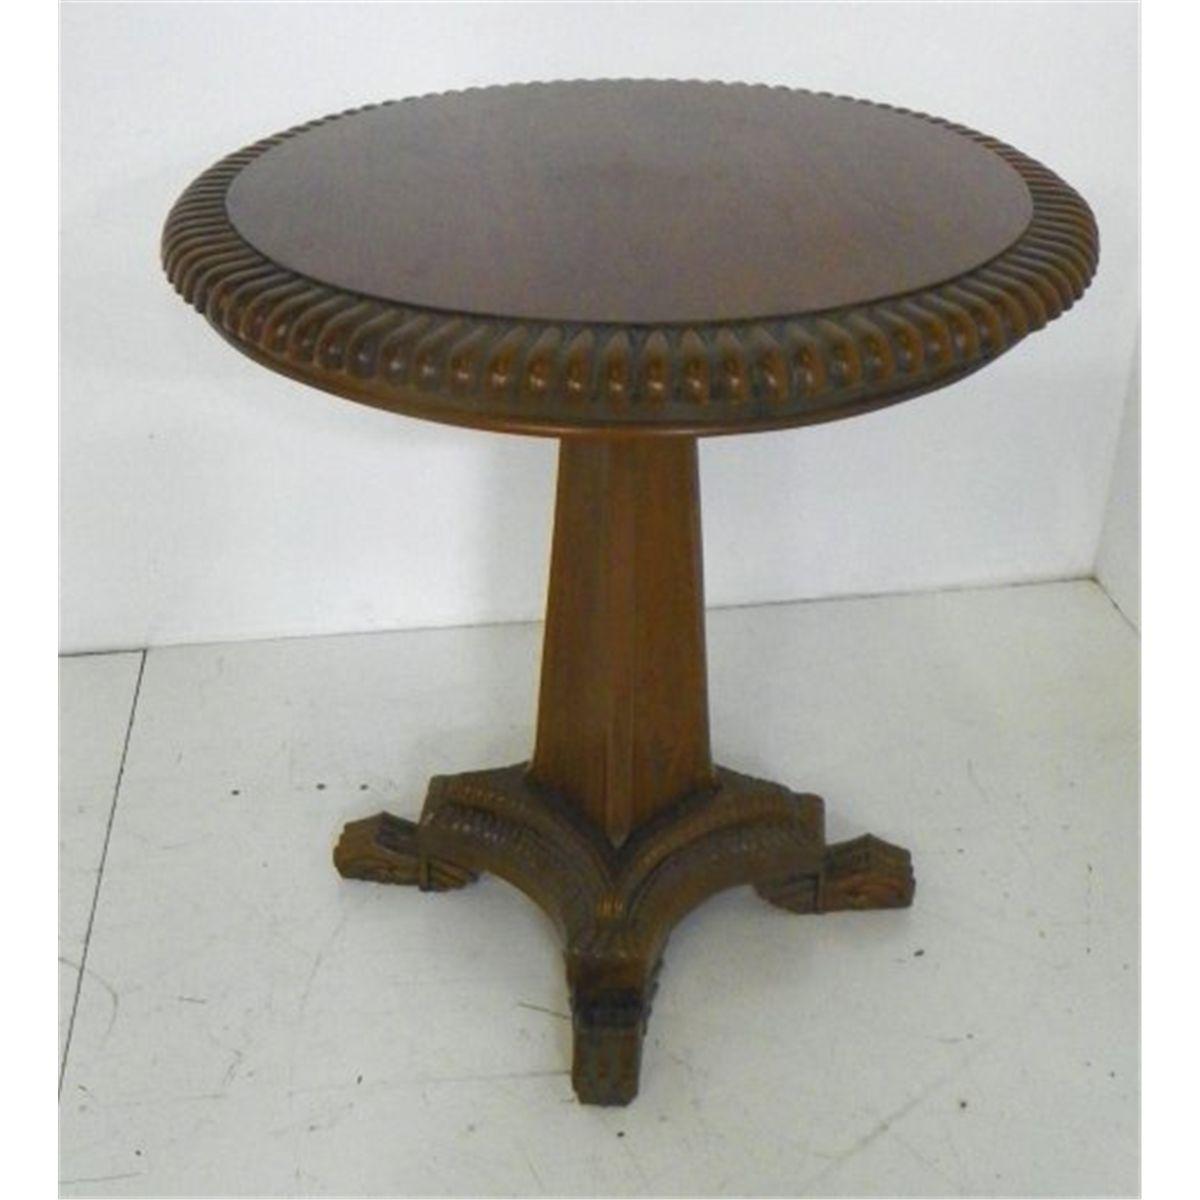 Image 1 : Regency Style Round Table Pedestal Base ...